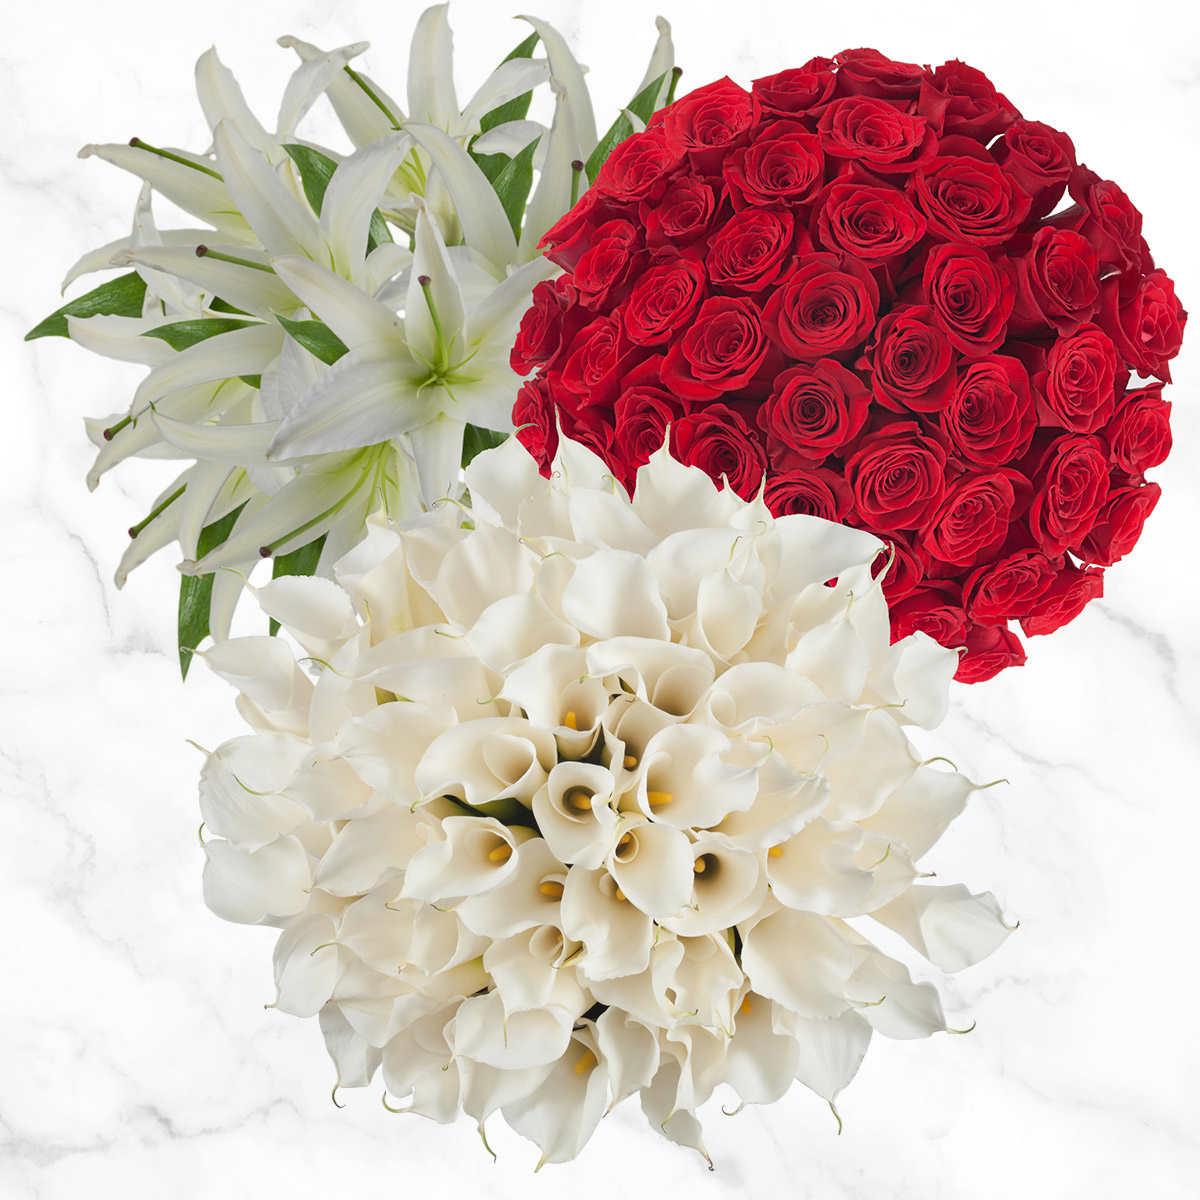 Home bulk roses peach roses - Combo Box Calla Lilies Roses Oriental Lilies